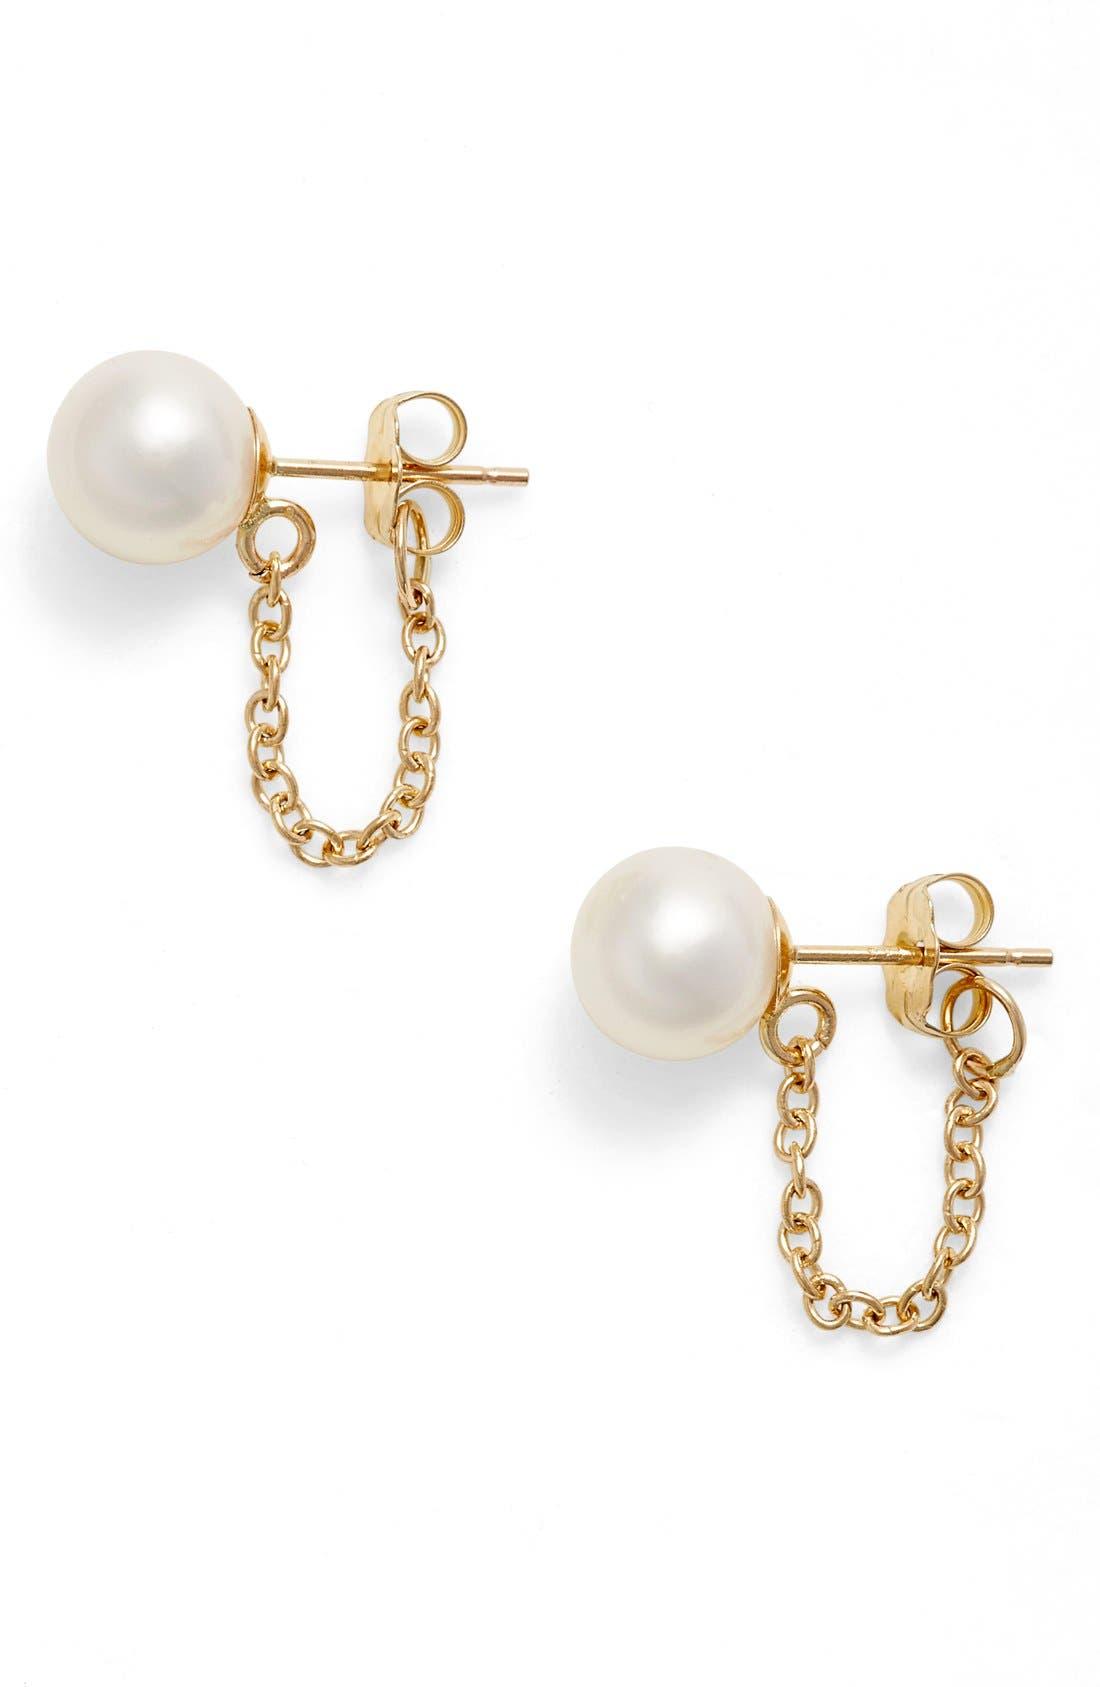 Main Image - Poppy Finch Pearl Ear Chains